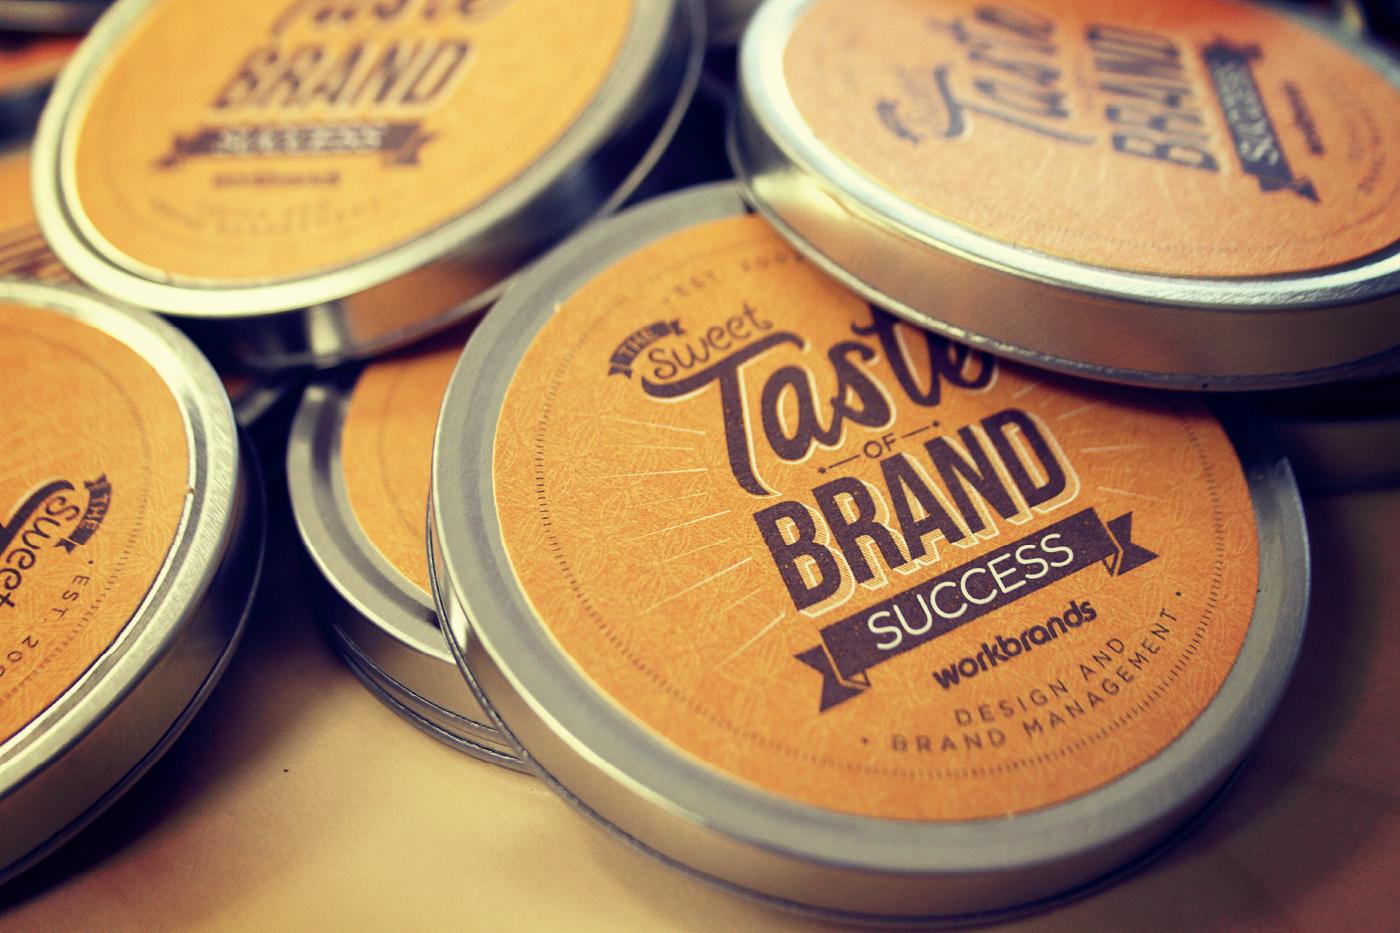 Brand Mark Brand Design Branding Success taste Sweets chocolate truffles bespoke type fonts brand management